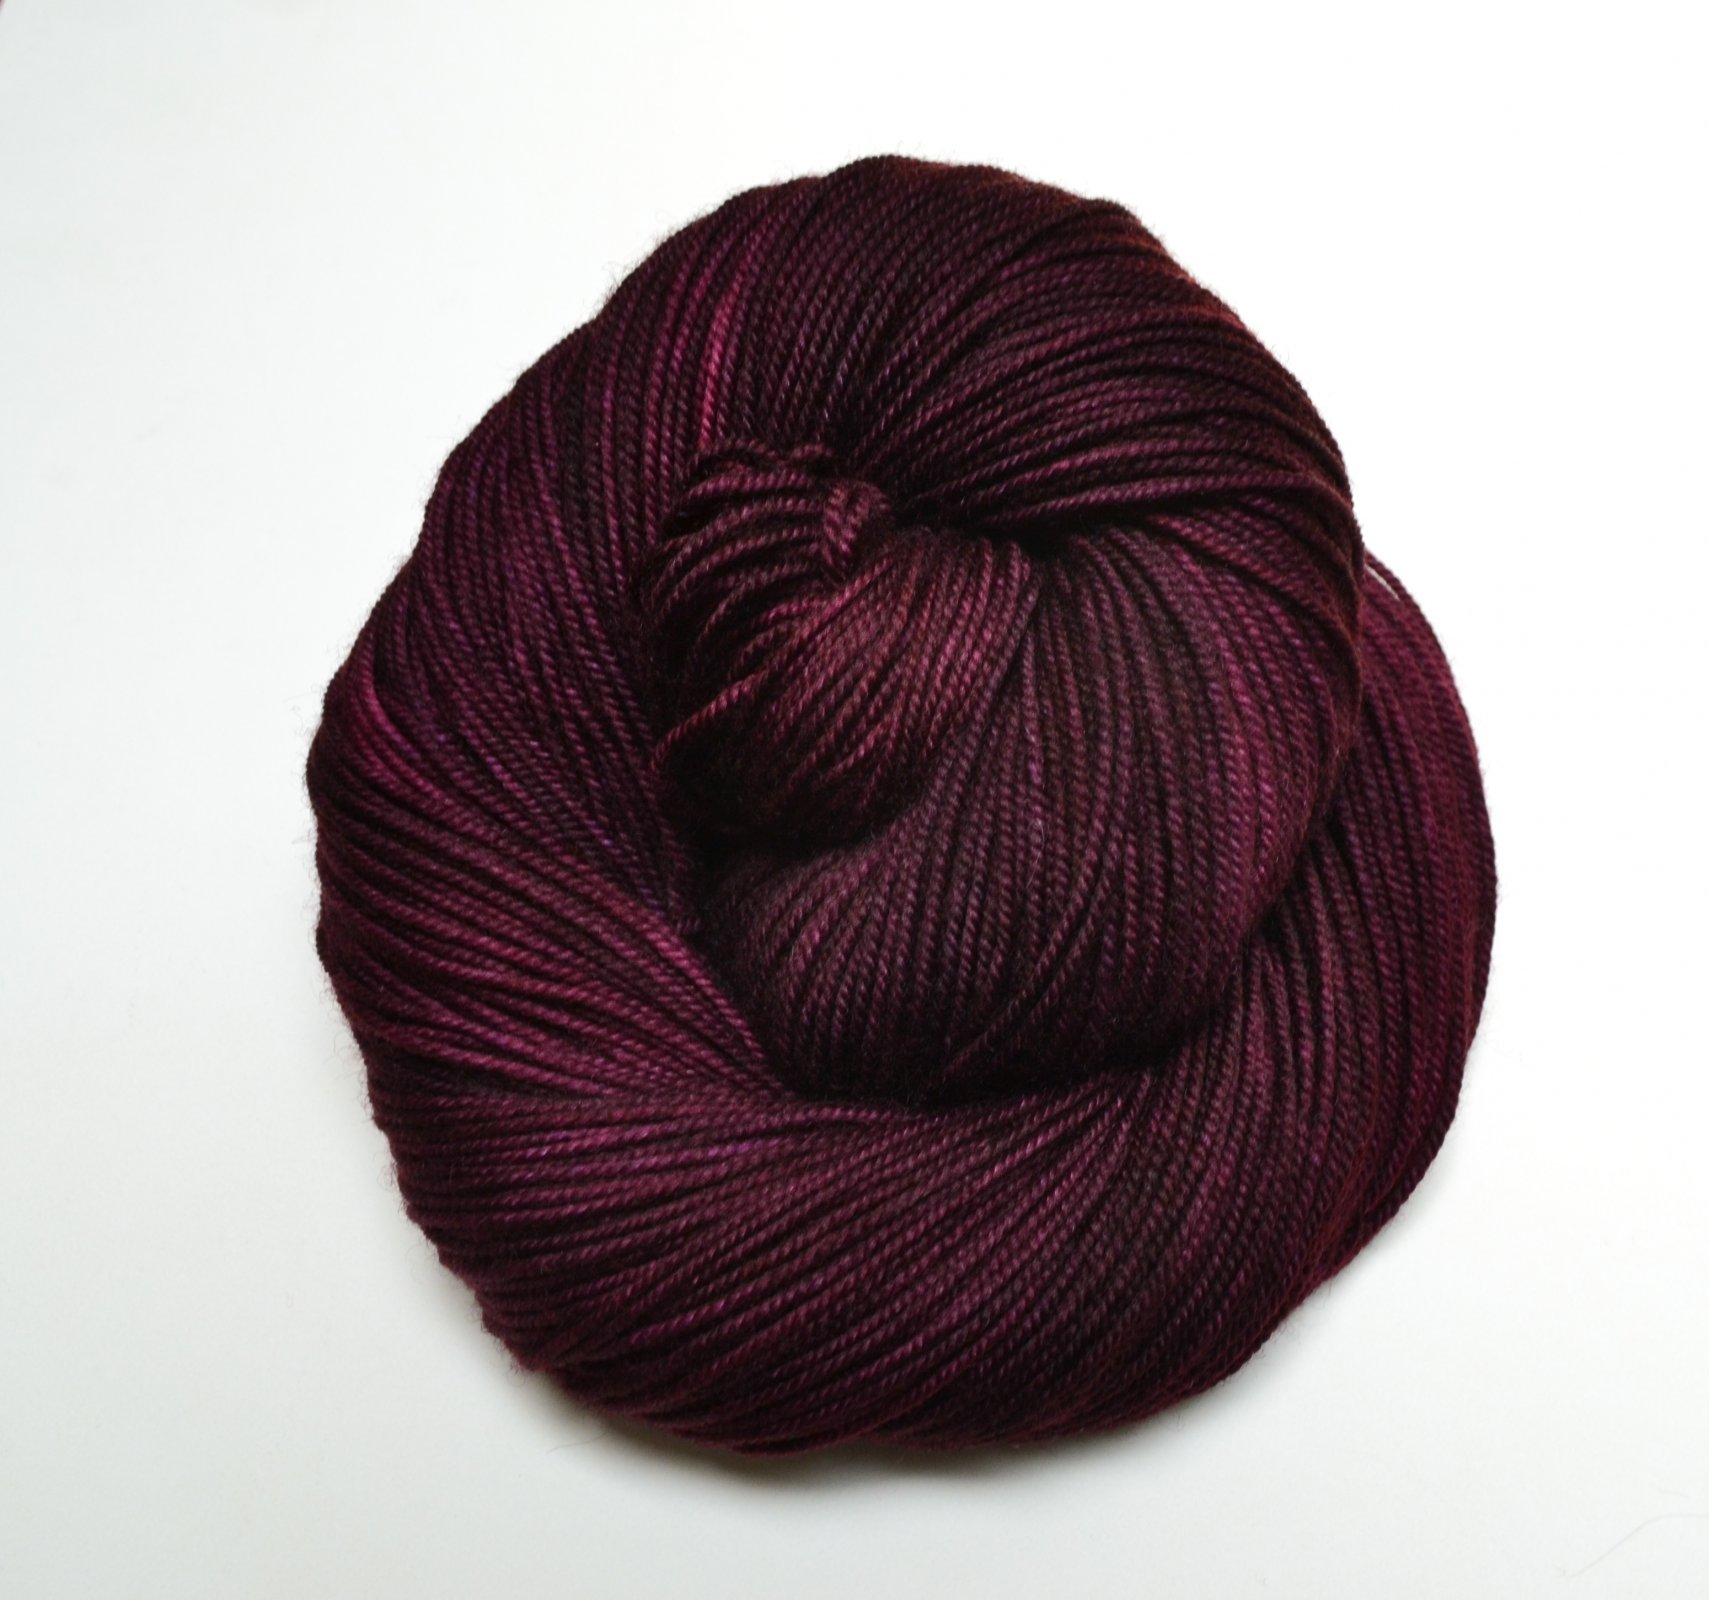 Yarns to Inspire Serenity Yarn